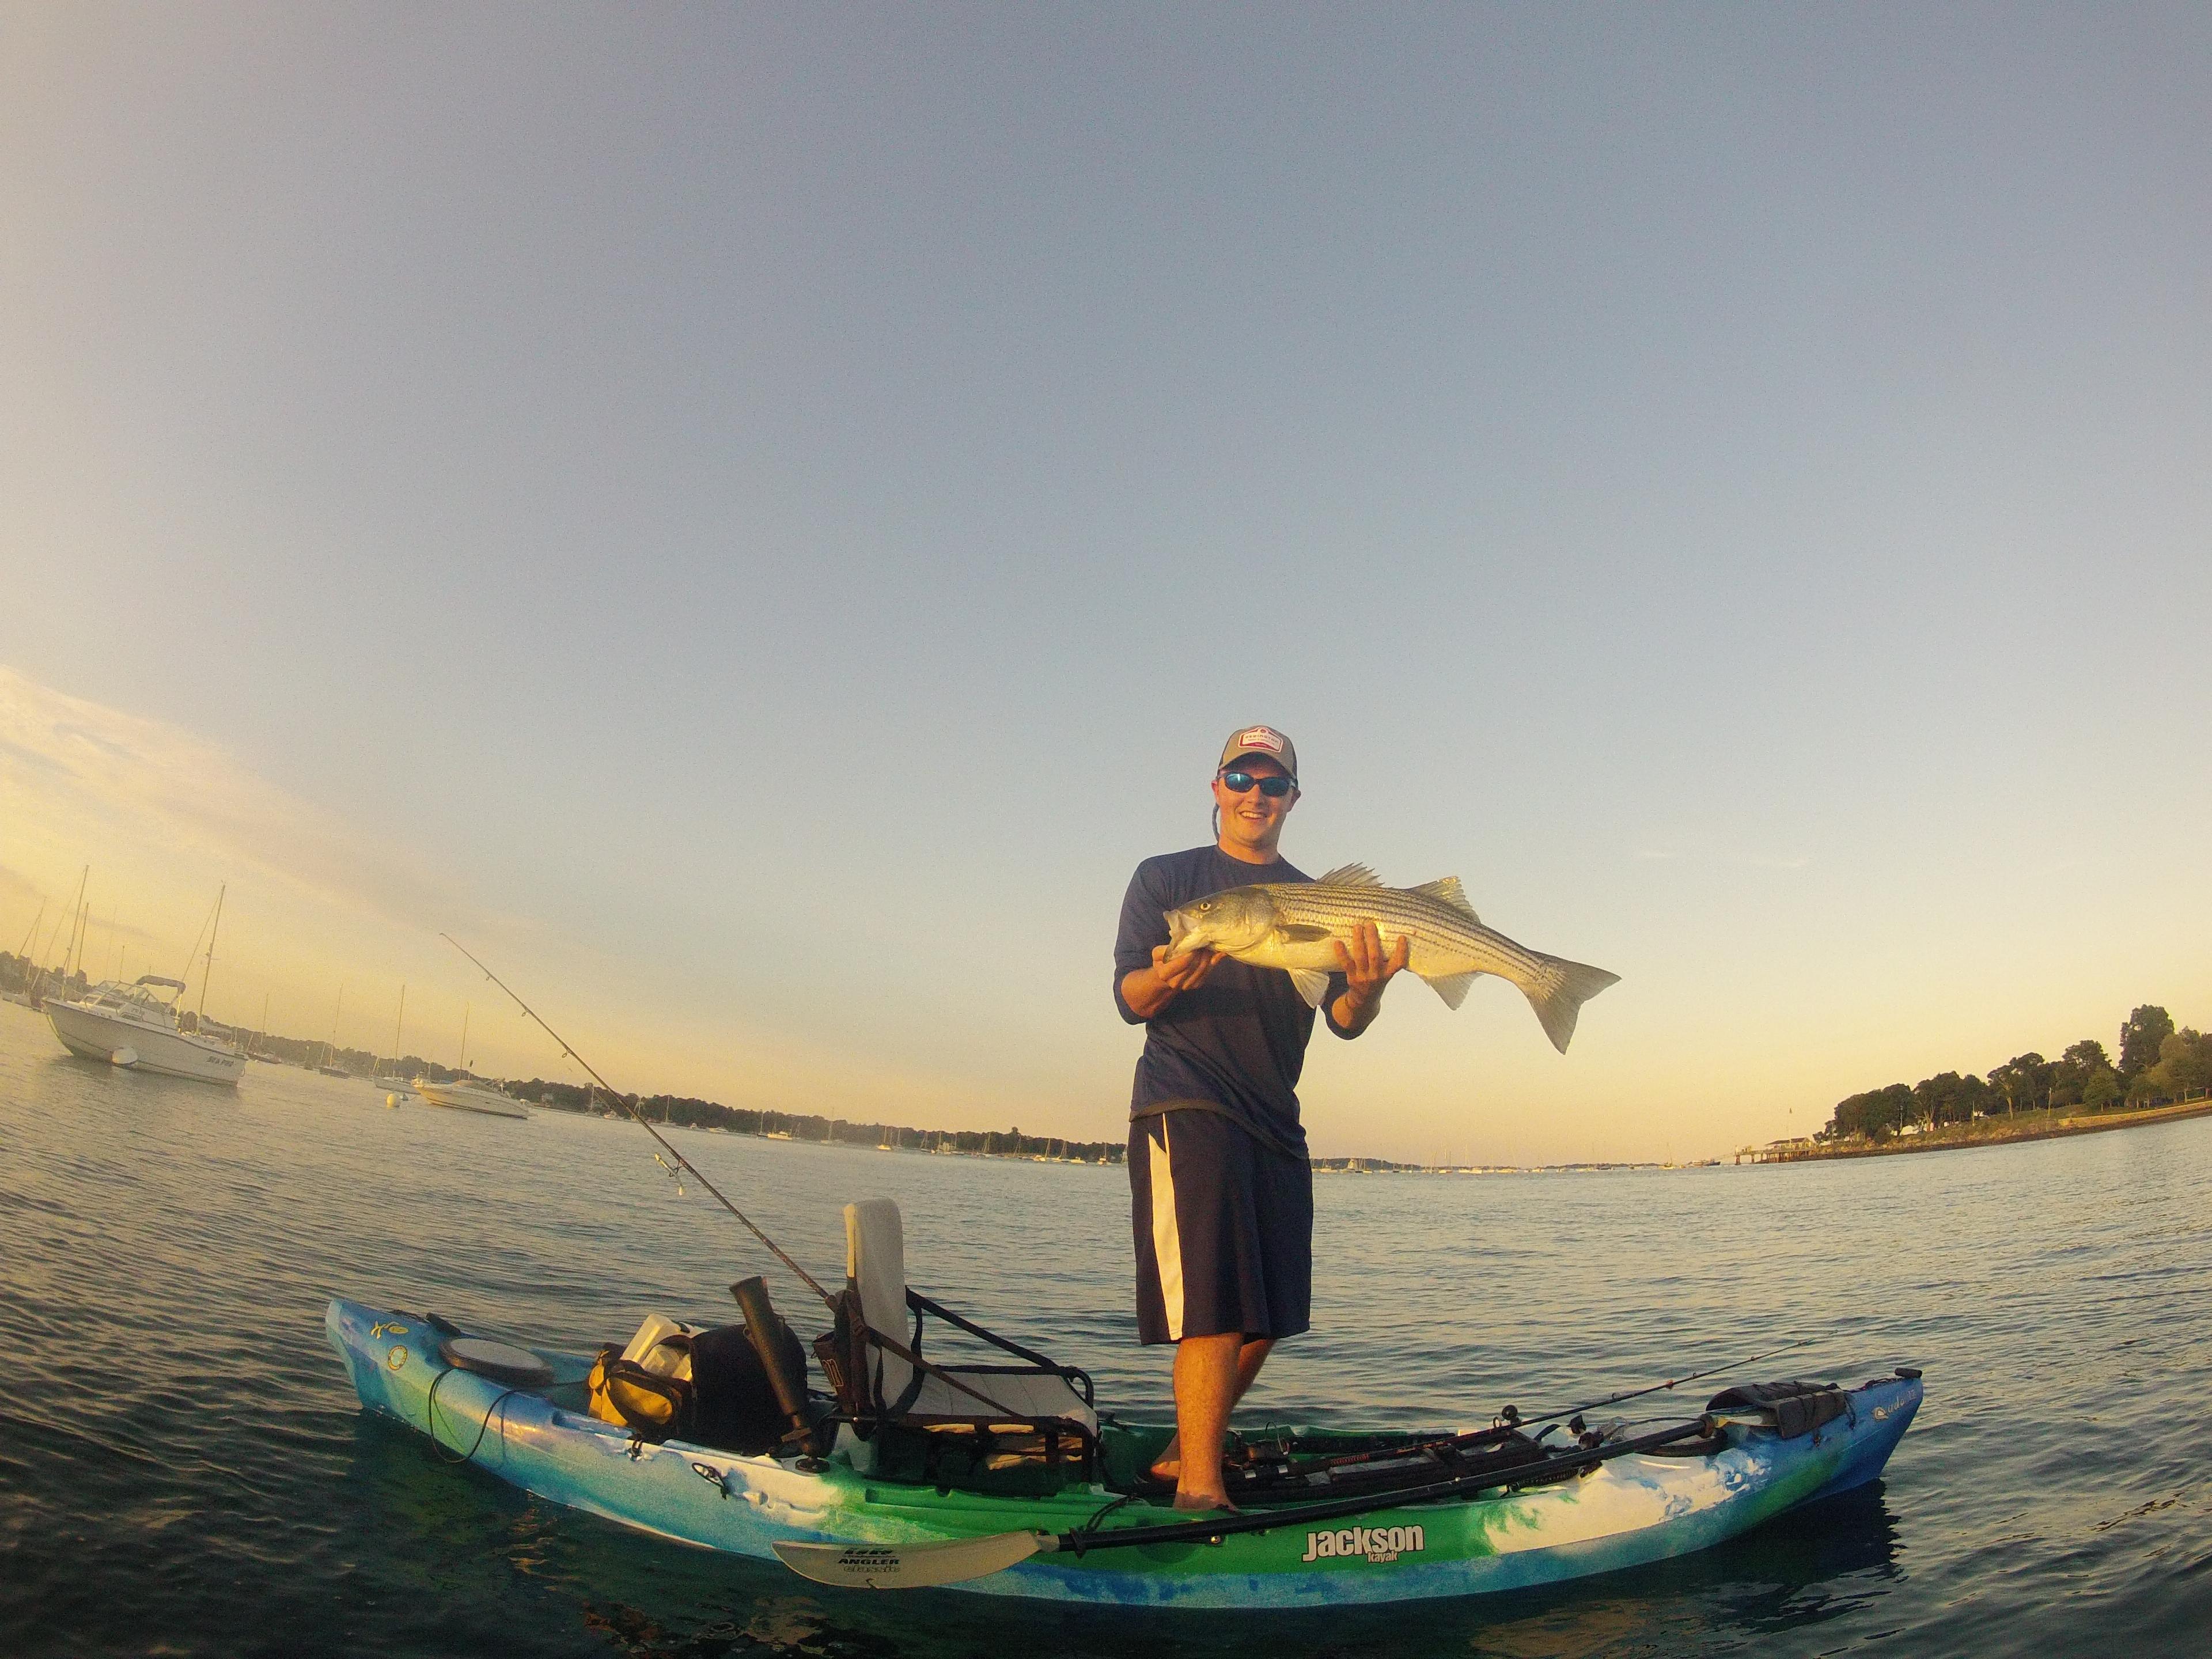 Massachusetts new hampshire and maine fishing report 8 15 for Ma fishing report